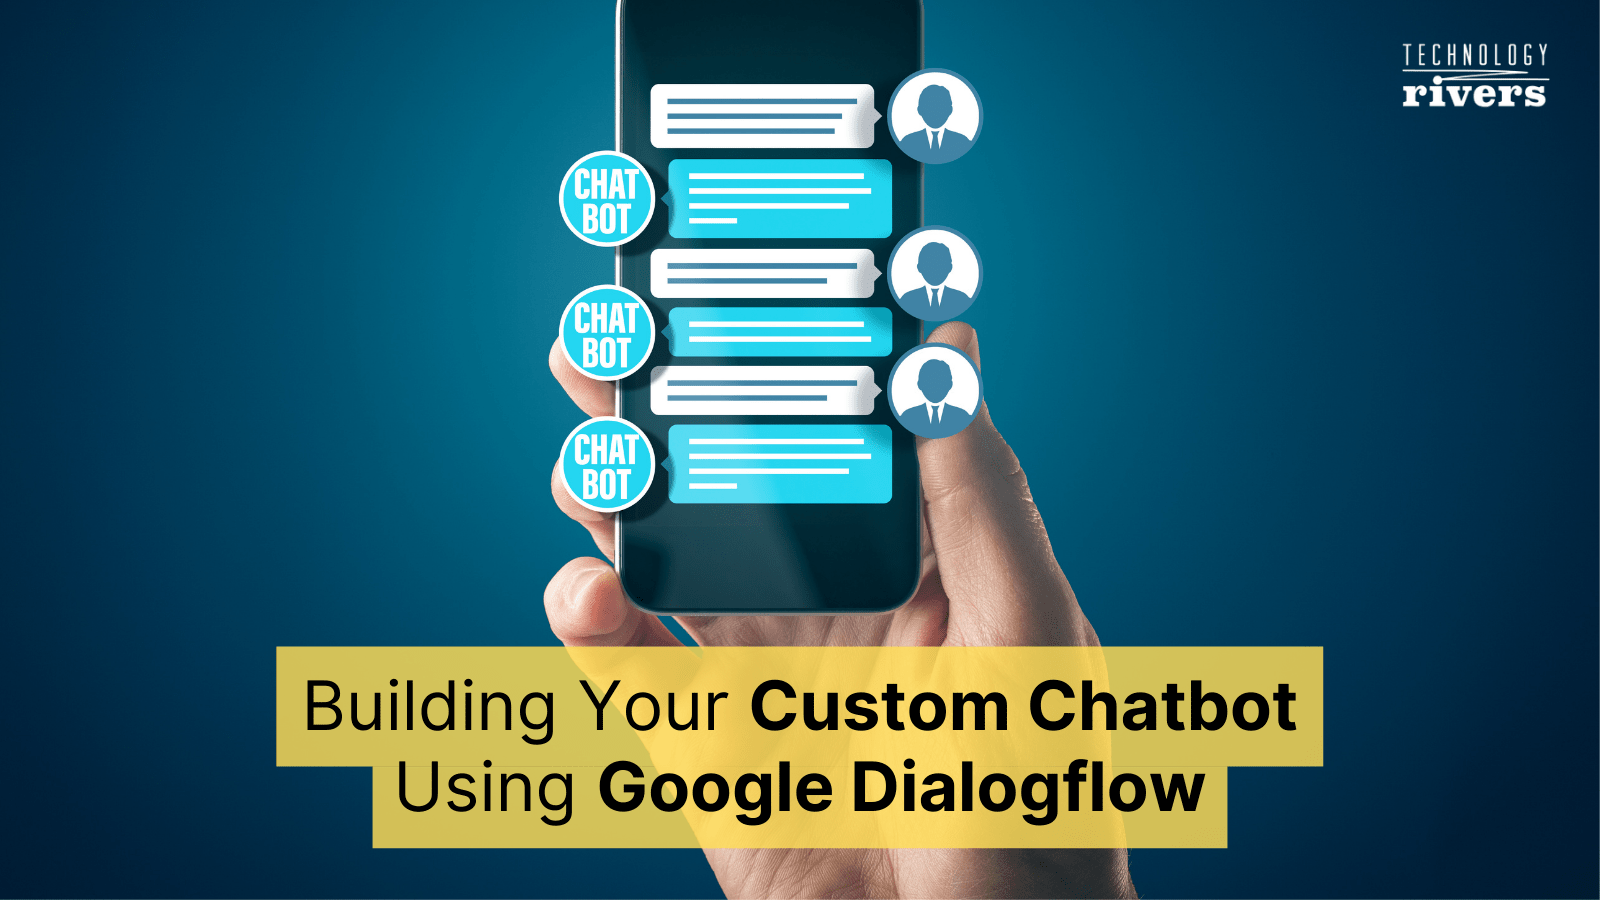 Building Your Custom Chatbot Using Google Dialogflow 1